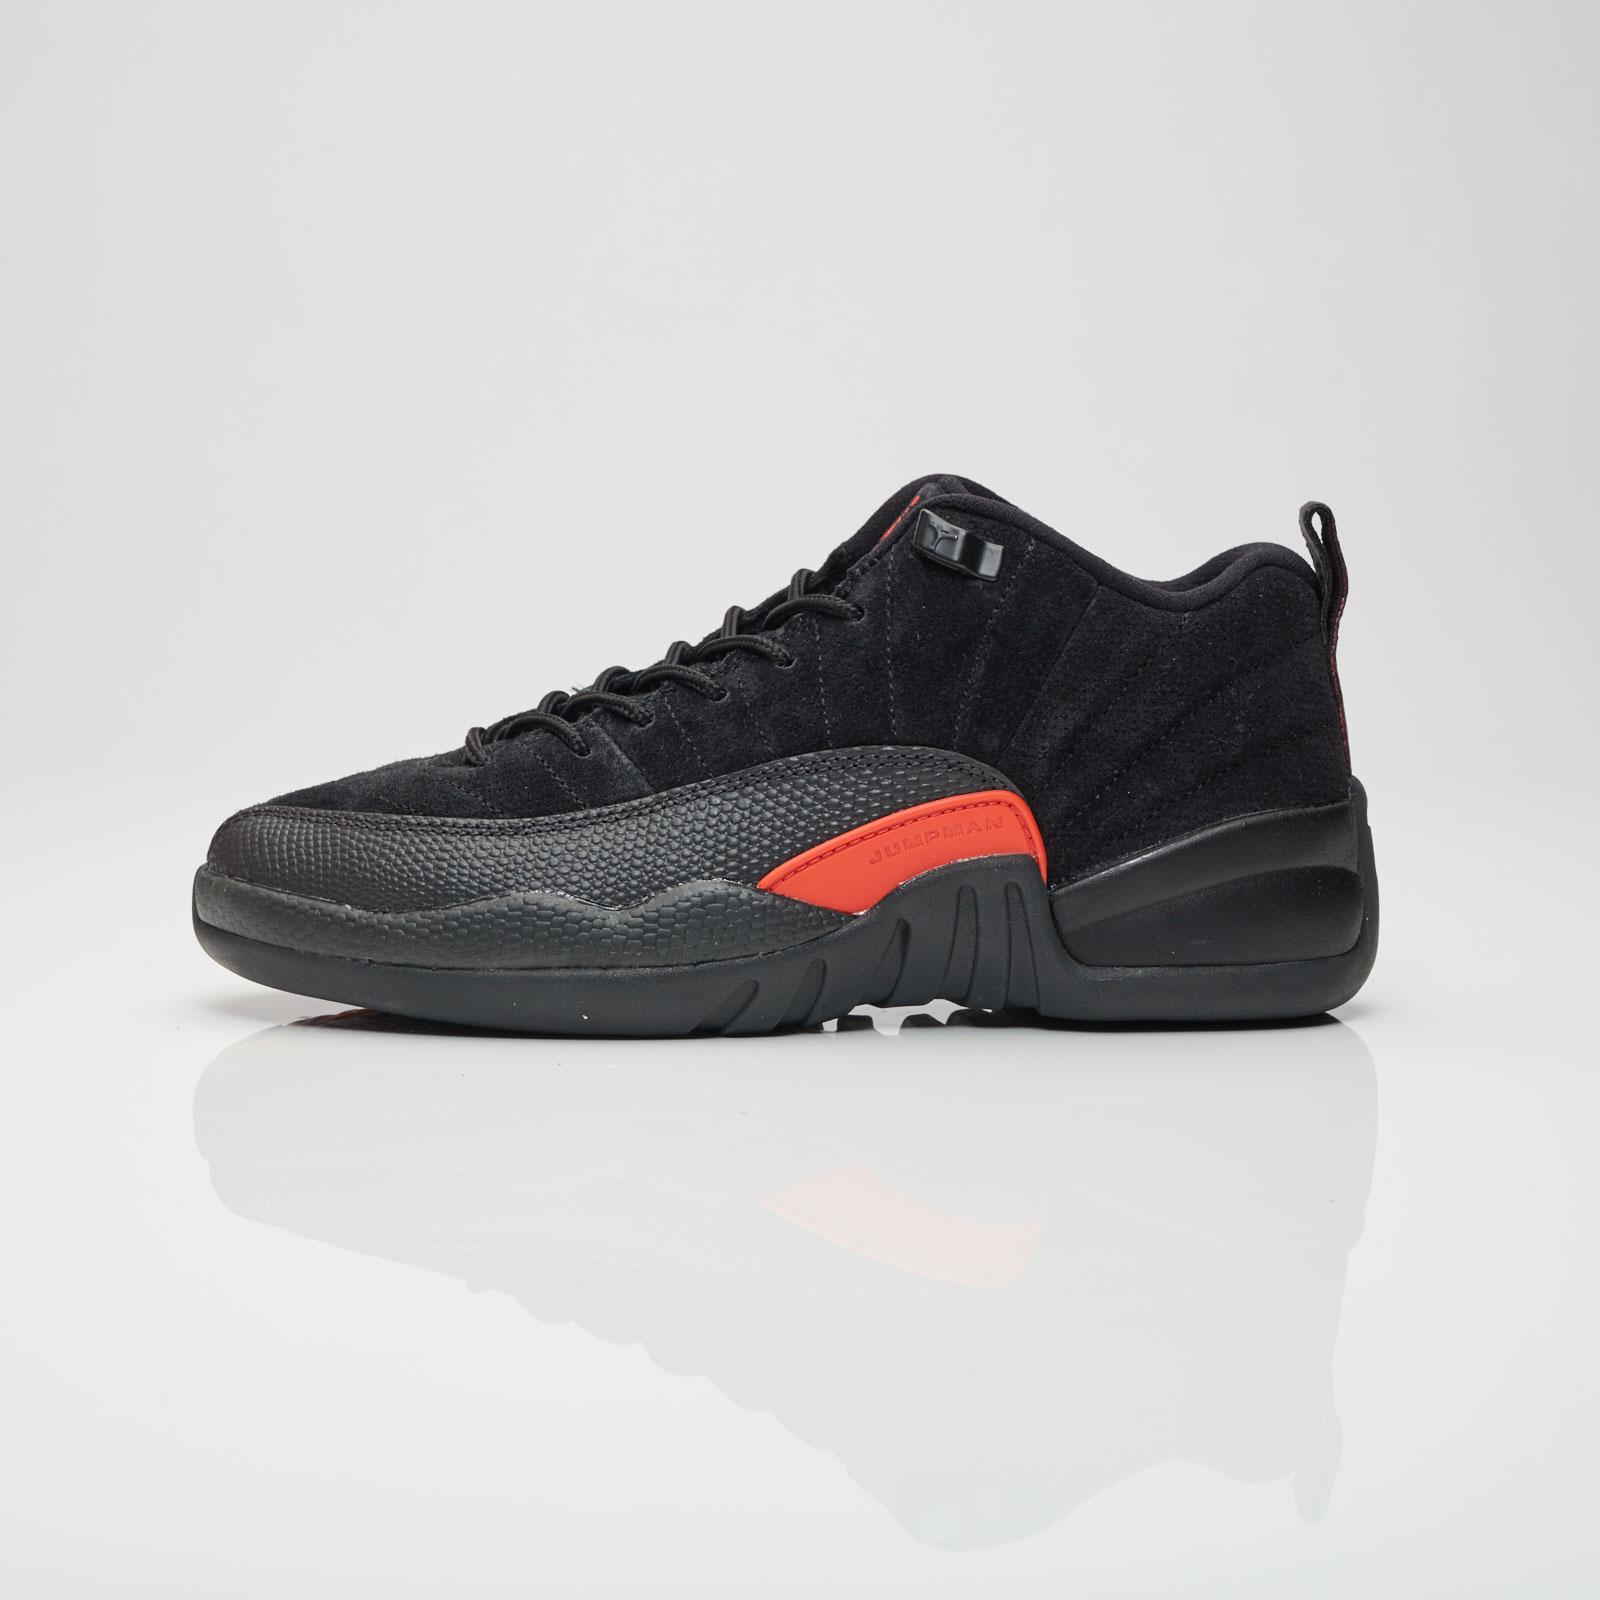 Air Jordan 12 Retro Low 'Max Orange' - 308305-003 - Size 6 - Us Size NndTVSRW